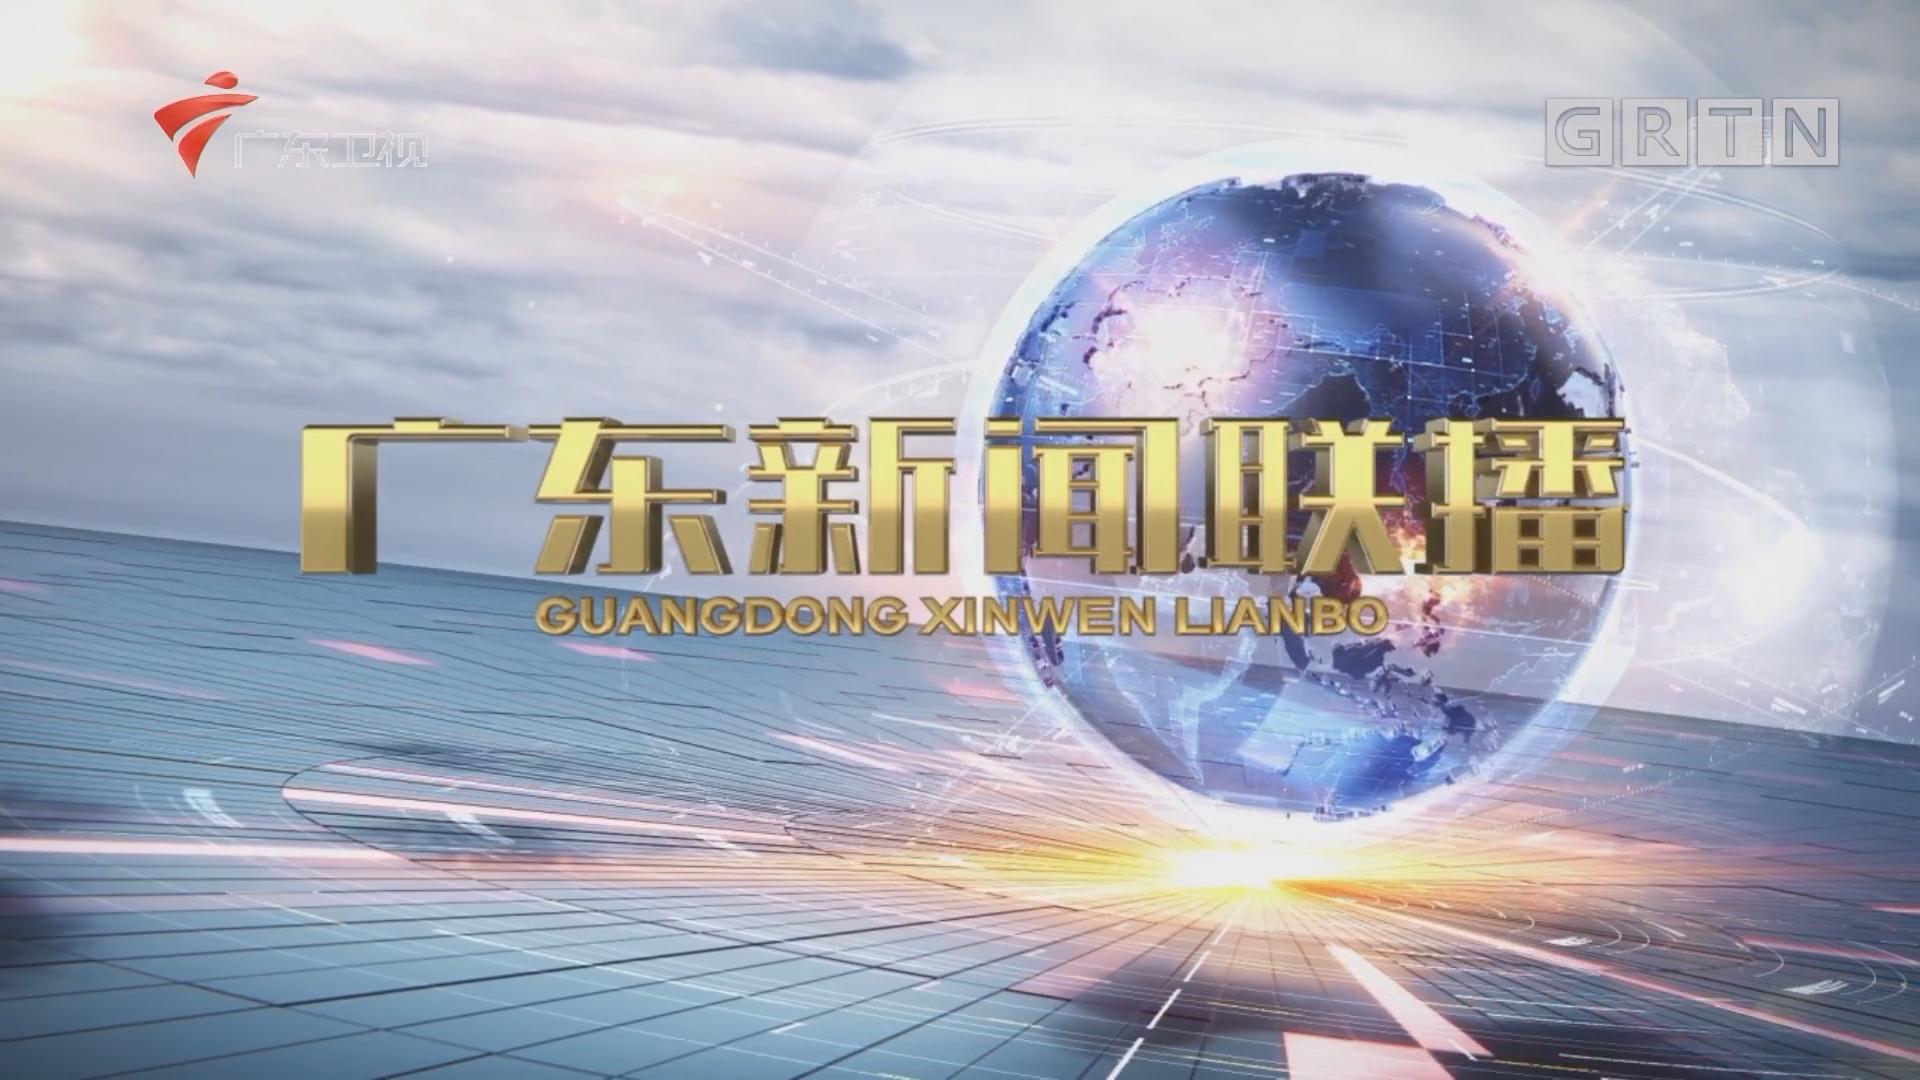 [HD][2019-07-03]广东新闻联播:全省公安工作会议在广州召开 李希出席并讲话 马兴瑞主持